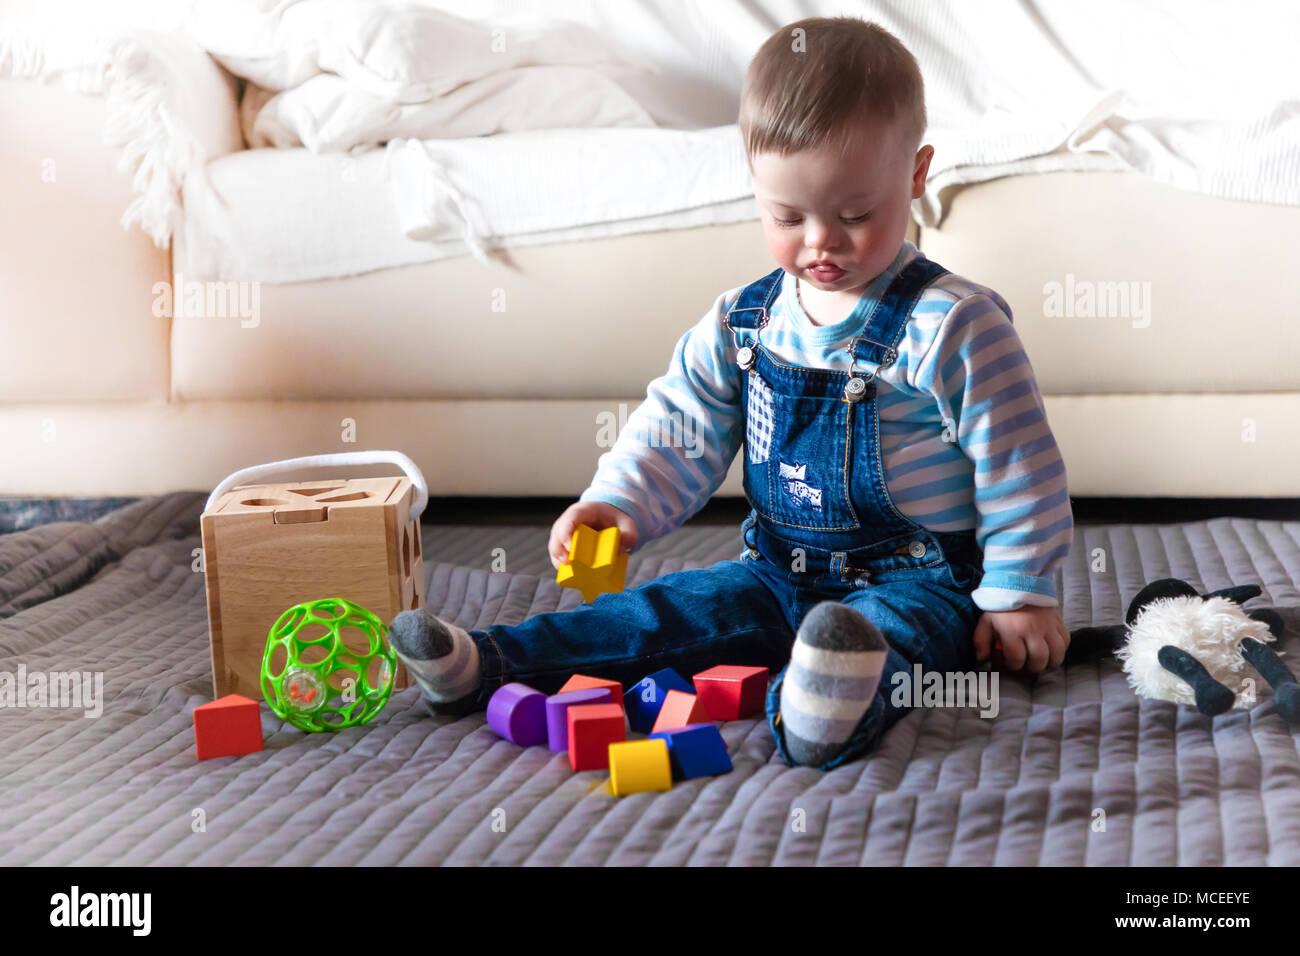 Retrato de lindo bebé niño con síndrome de Down Imagen De Stock